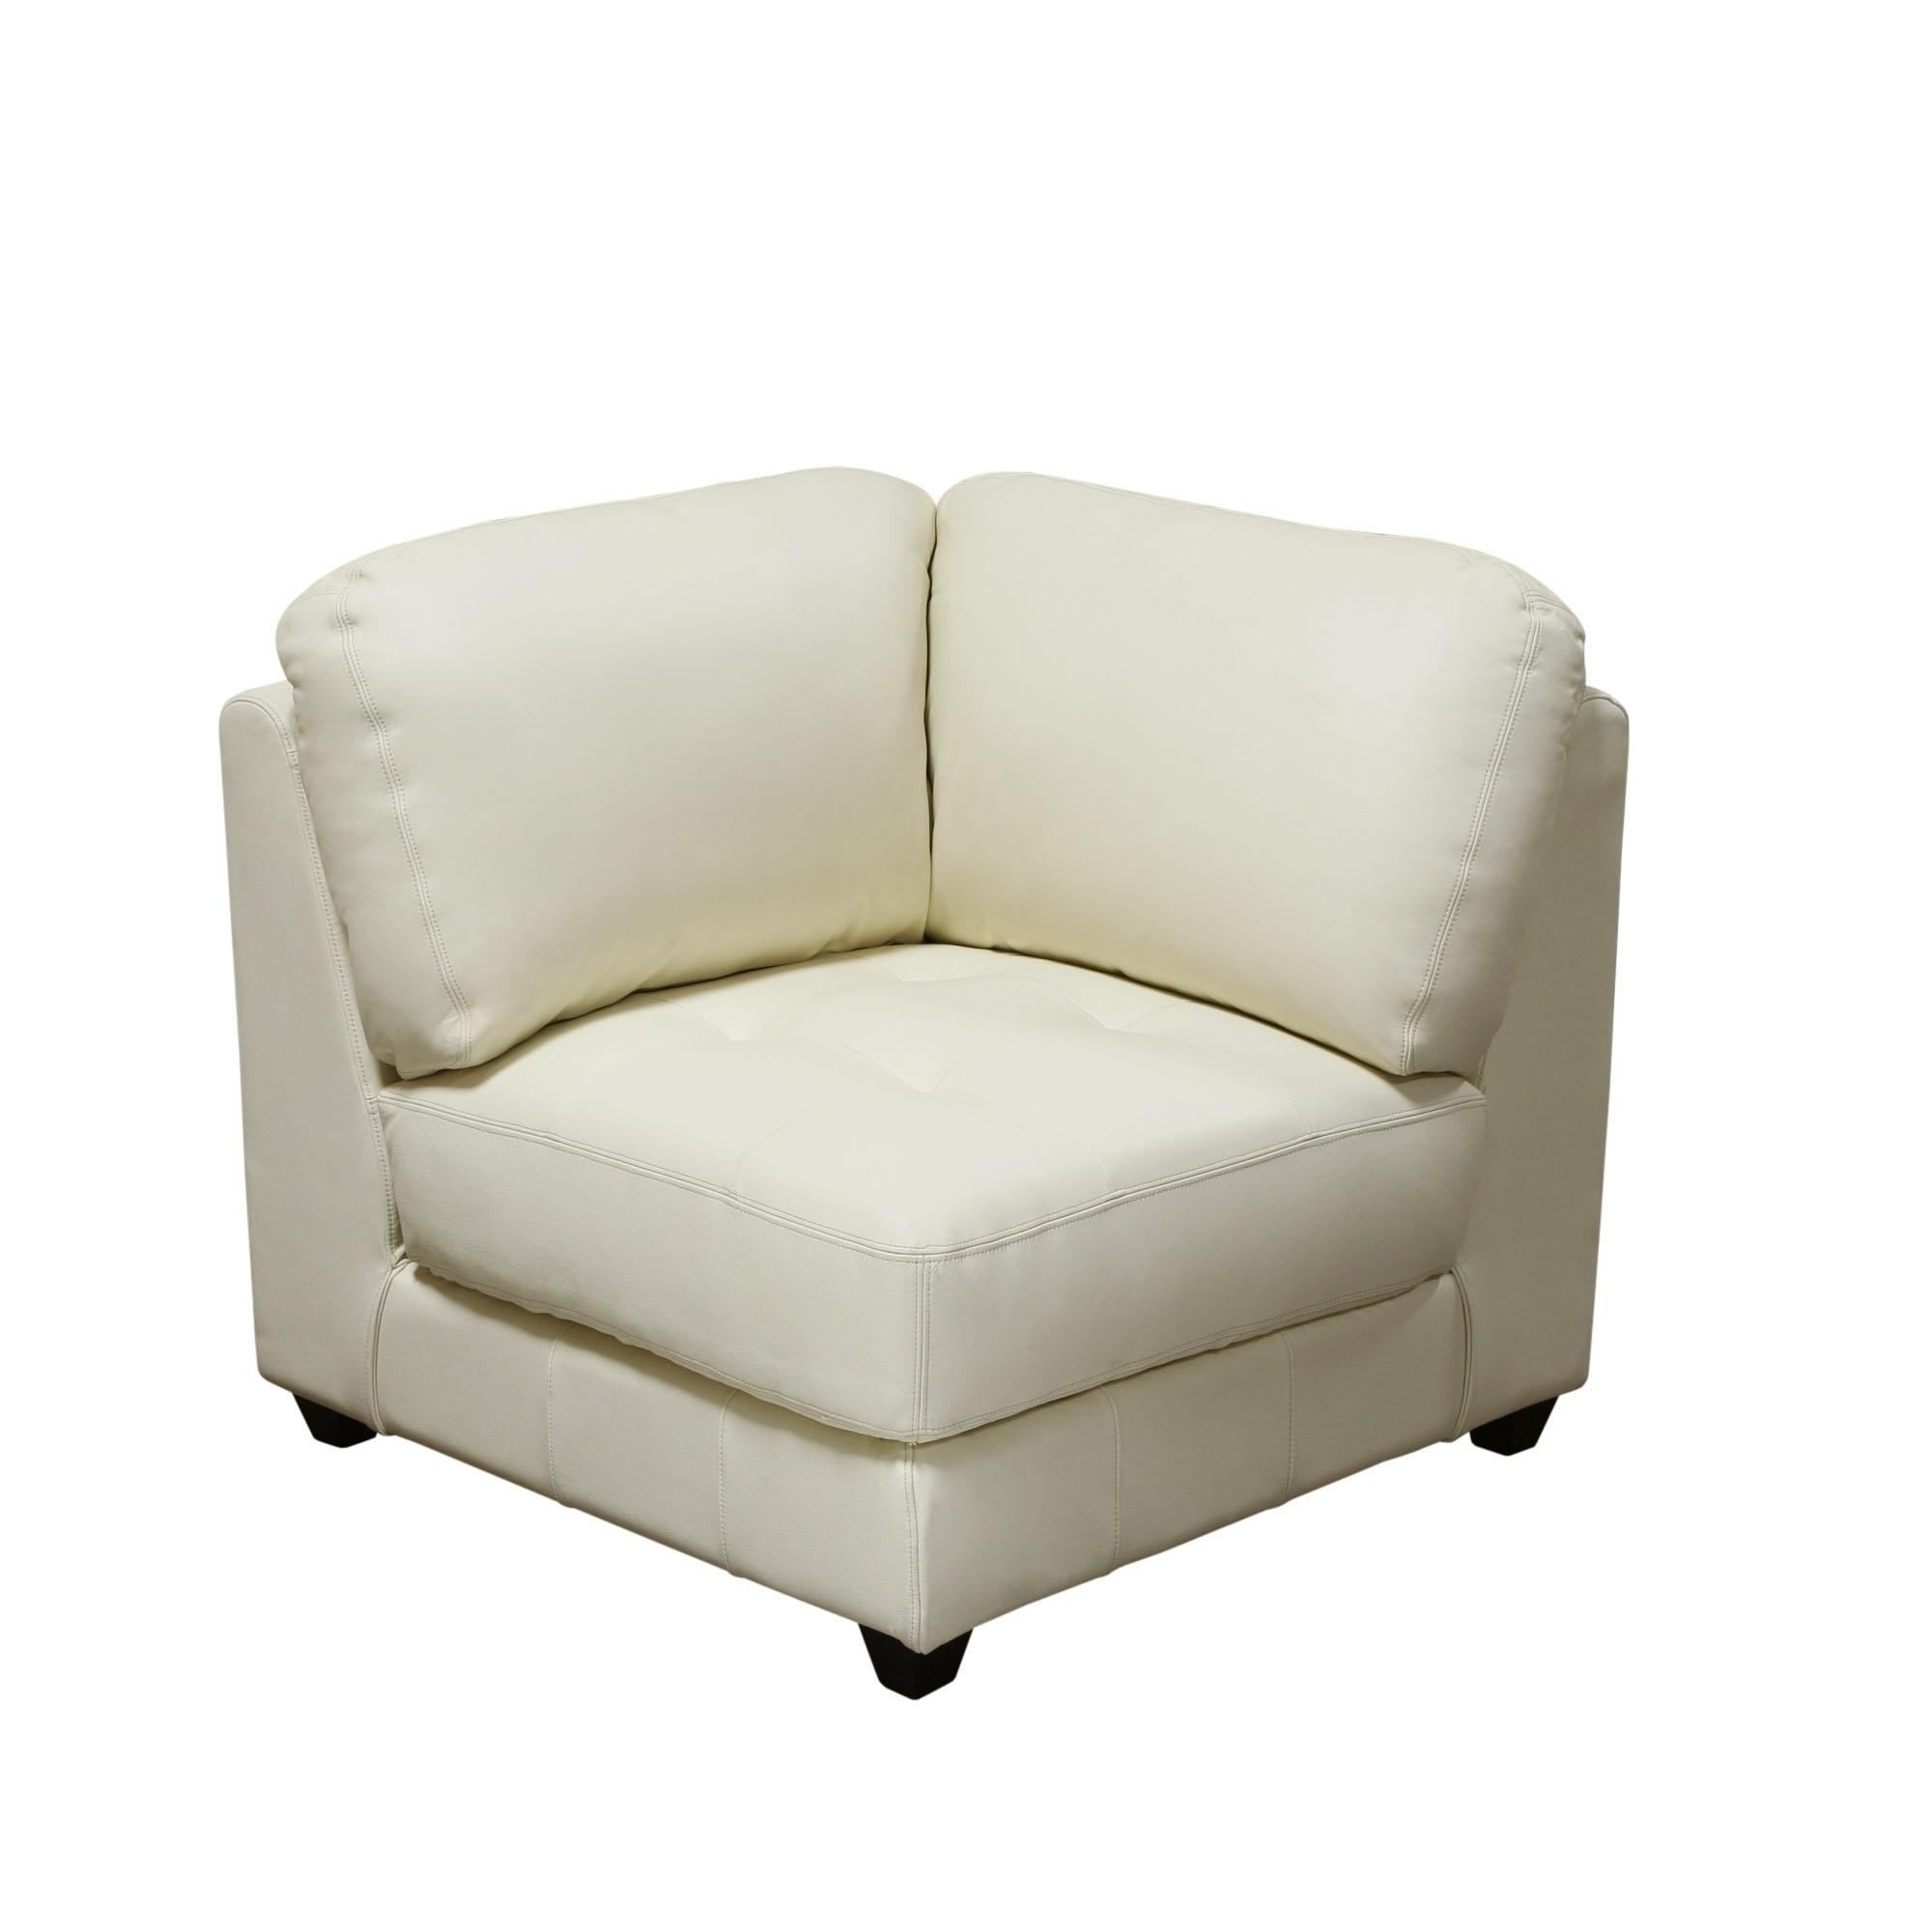 2019 Corner Sofa Chairs In Sofa Zen Collection Square Corner Chair Zensqcornerchair (View 2 of 20)